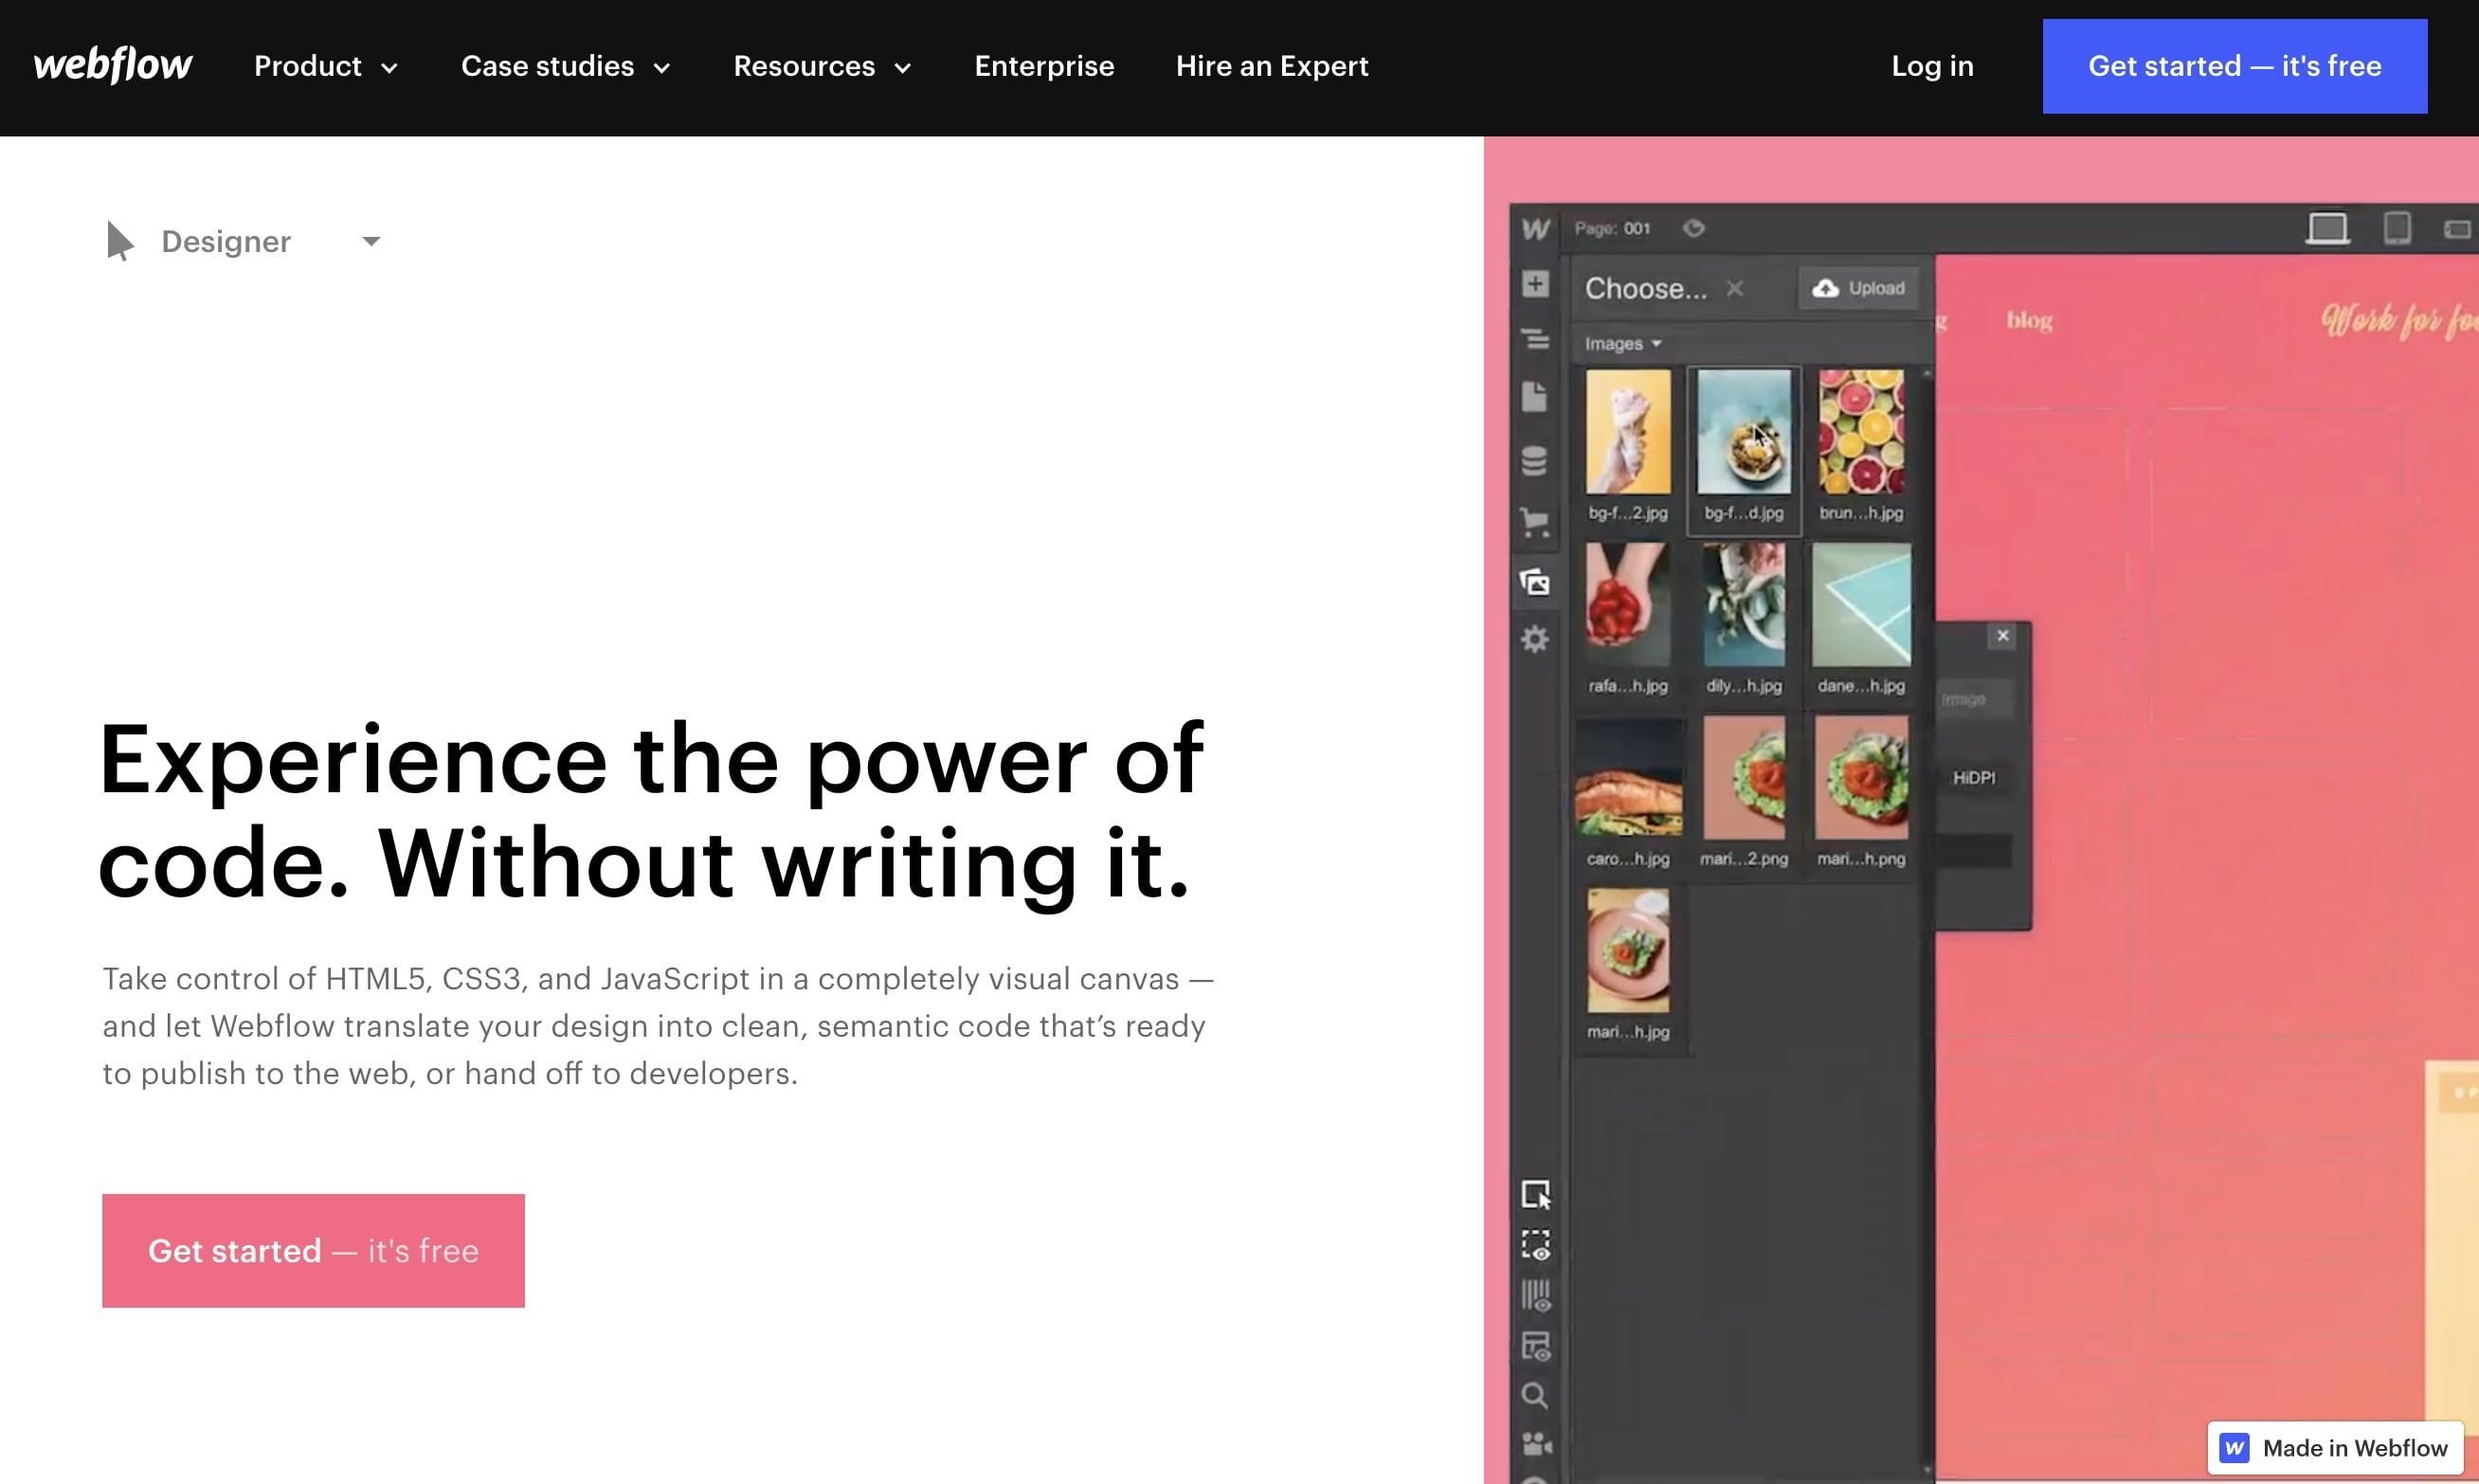 Webflow Designer product page